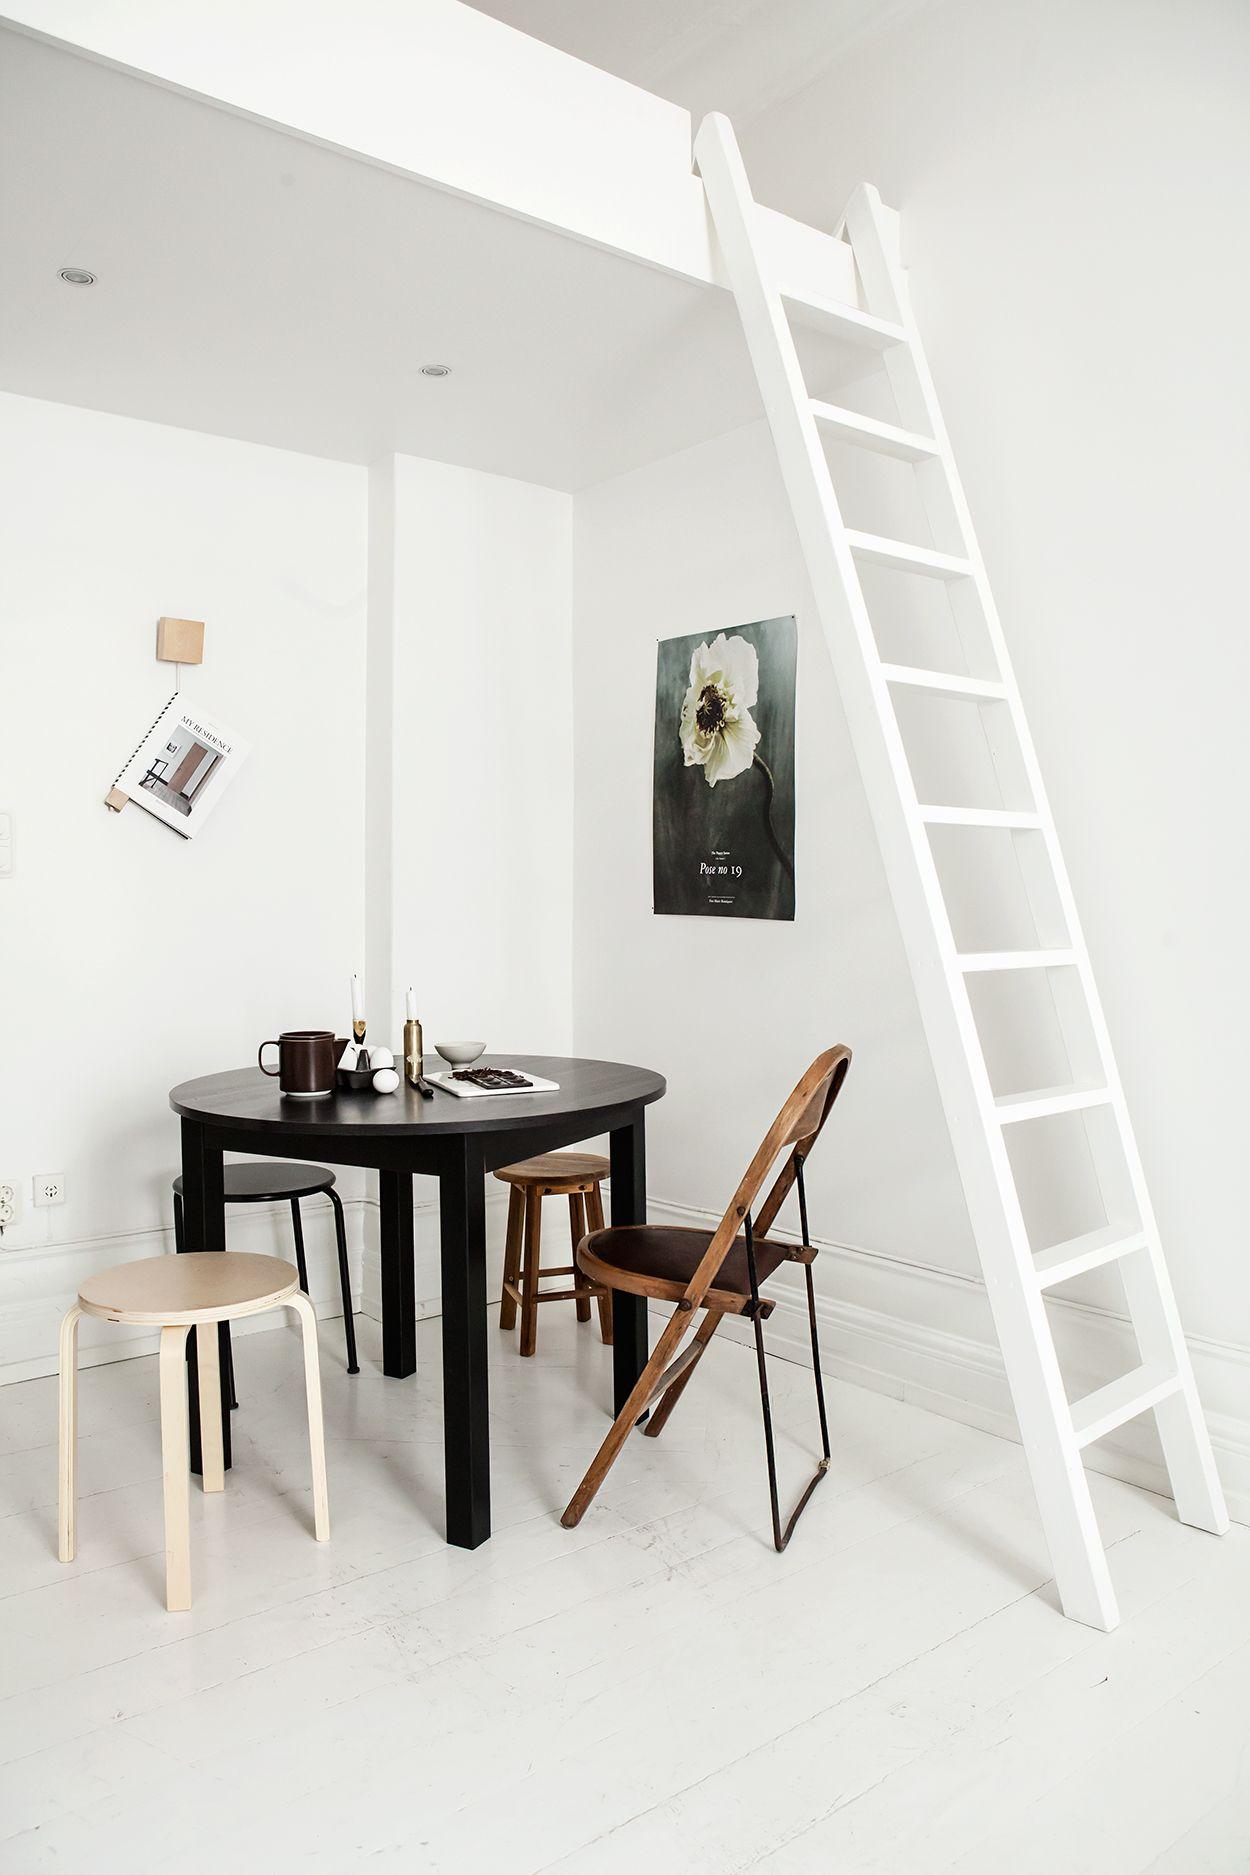 Small light studio apartment studio u loft apartment blog